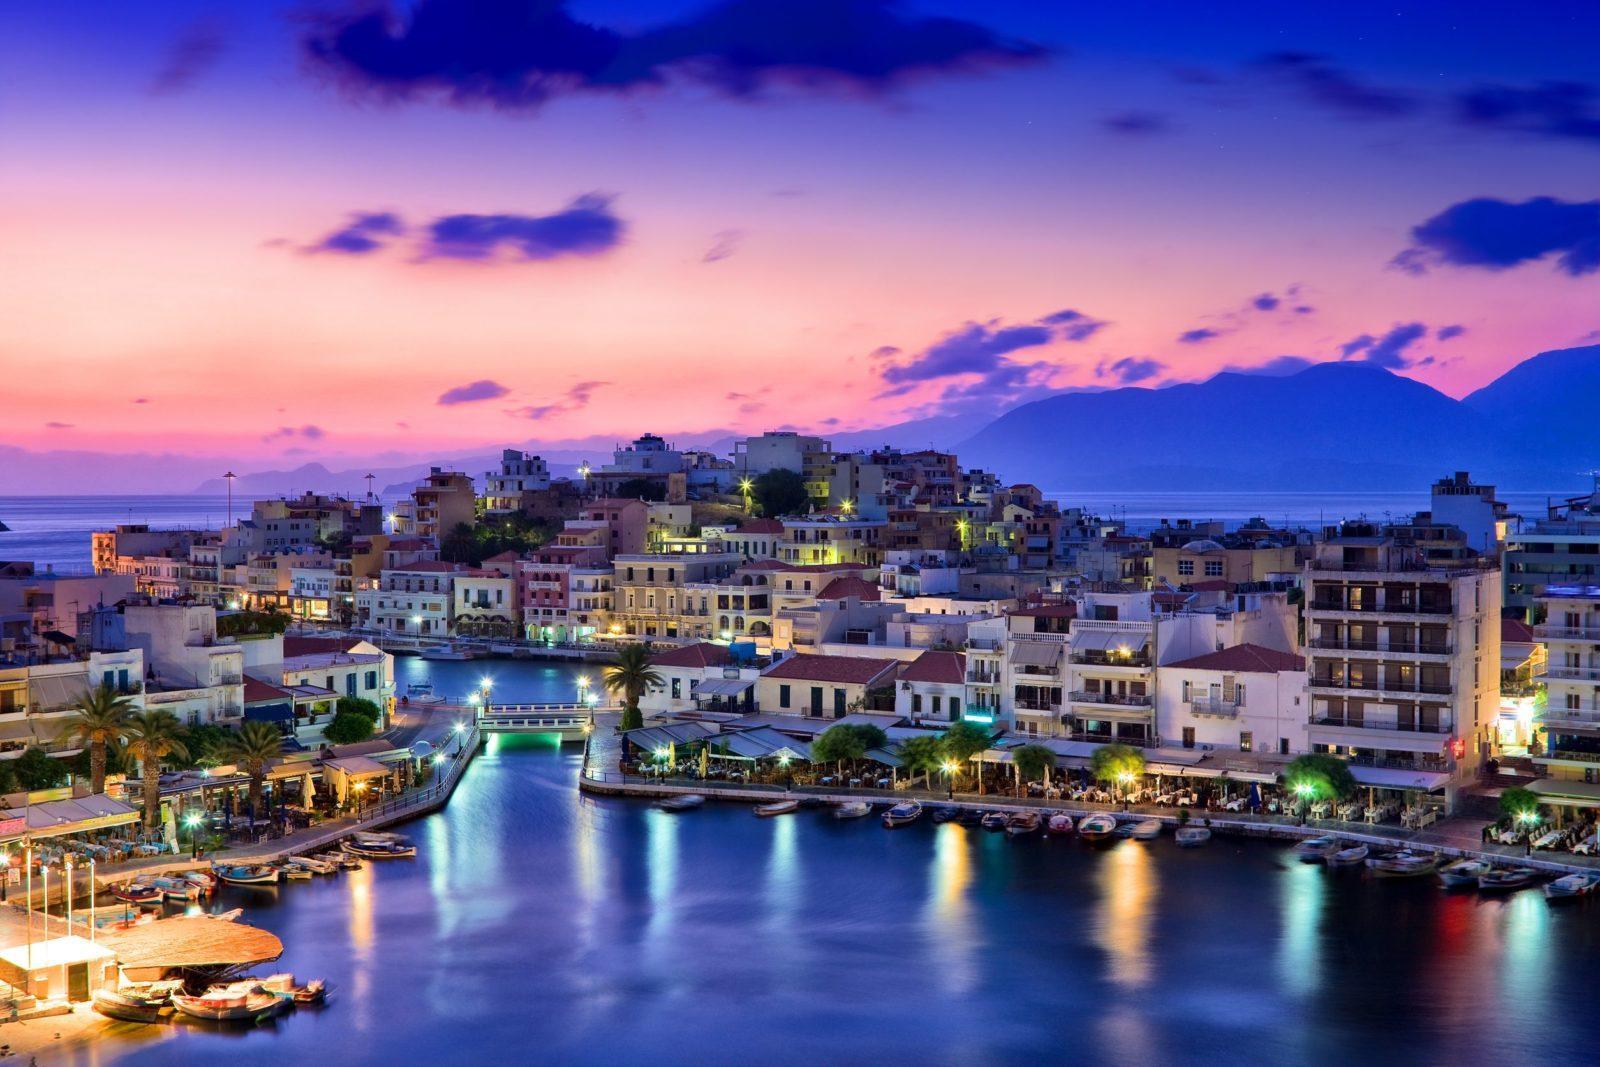 crete - ავიაბილეთები კრეტა